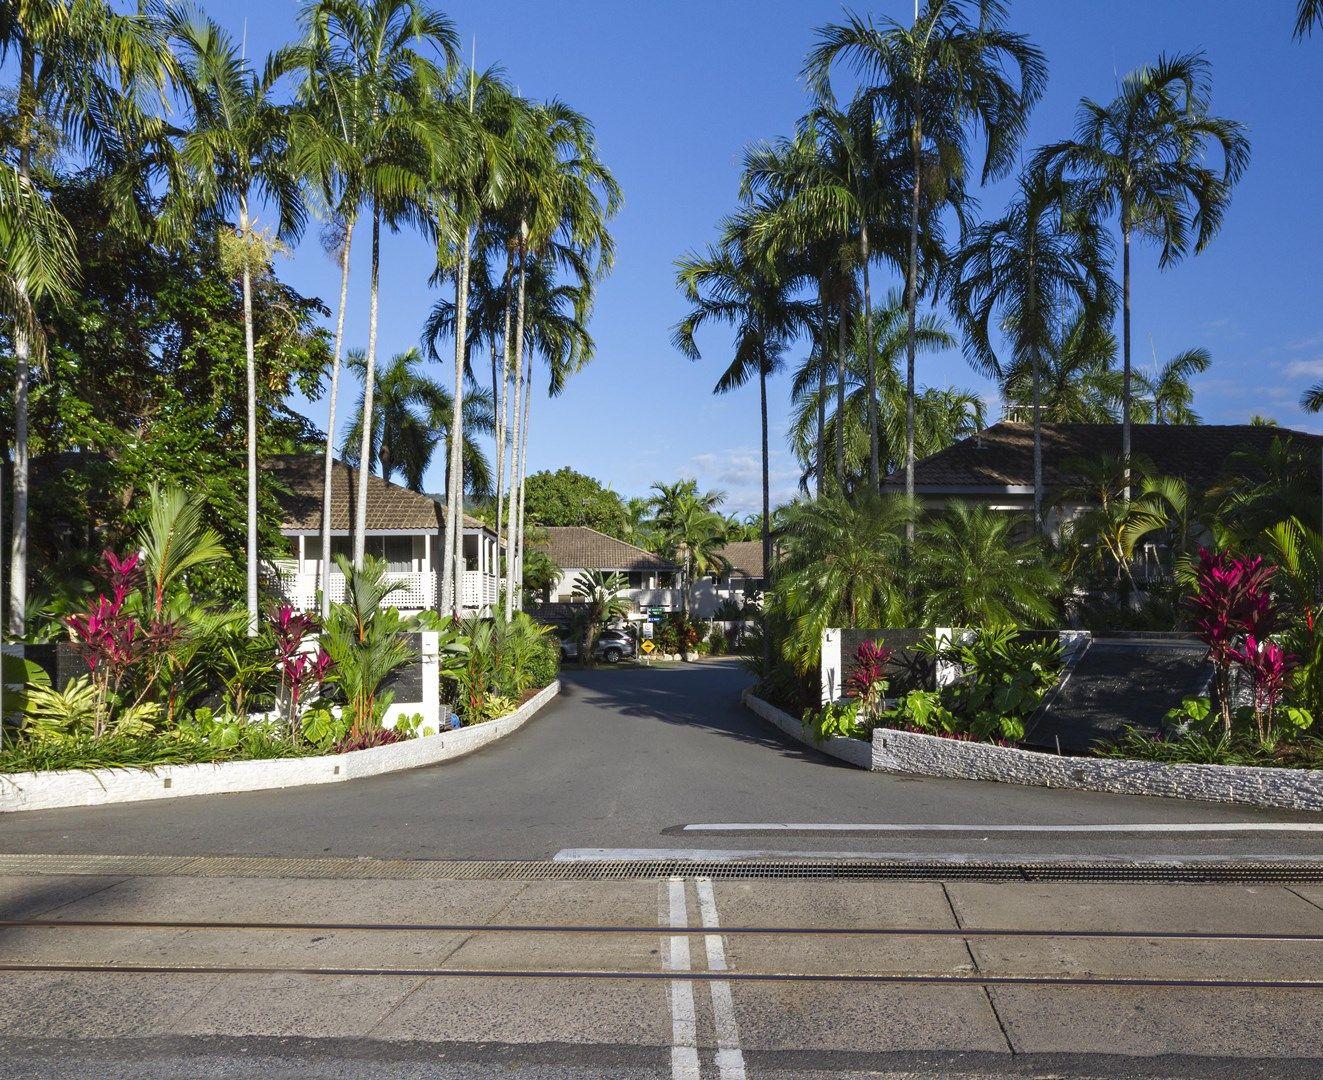 143/121 Port Douglas Road, Port Douglas QLD 4877, Image 1